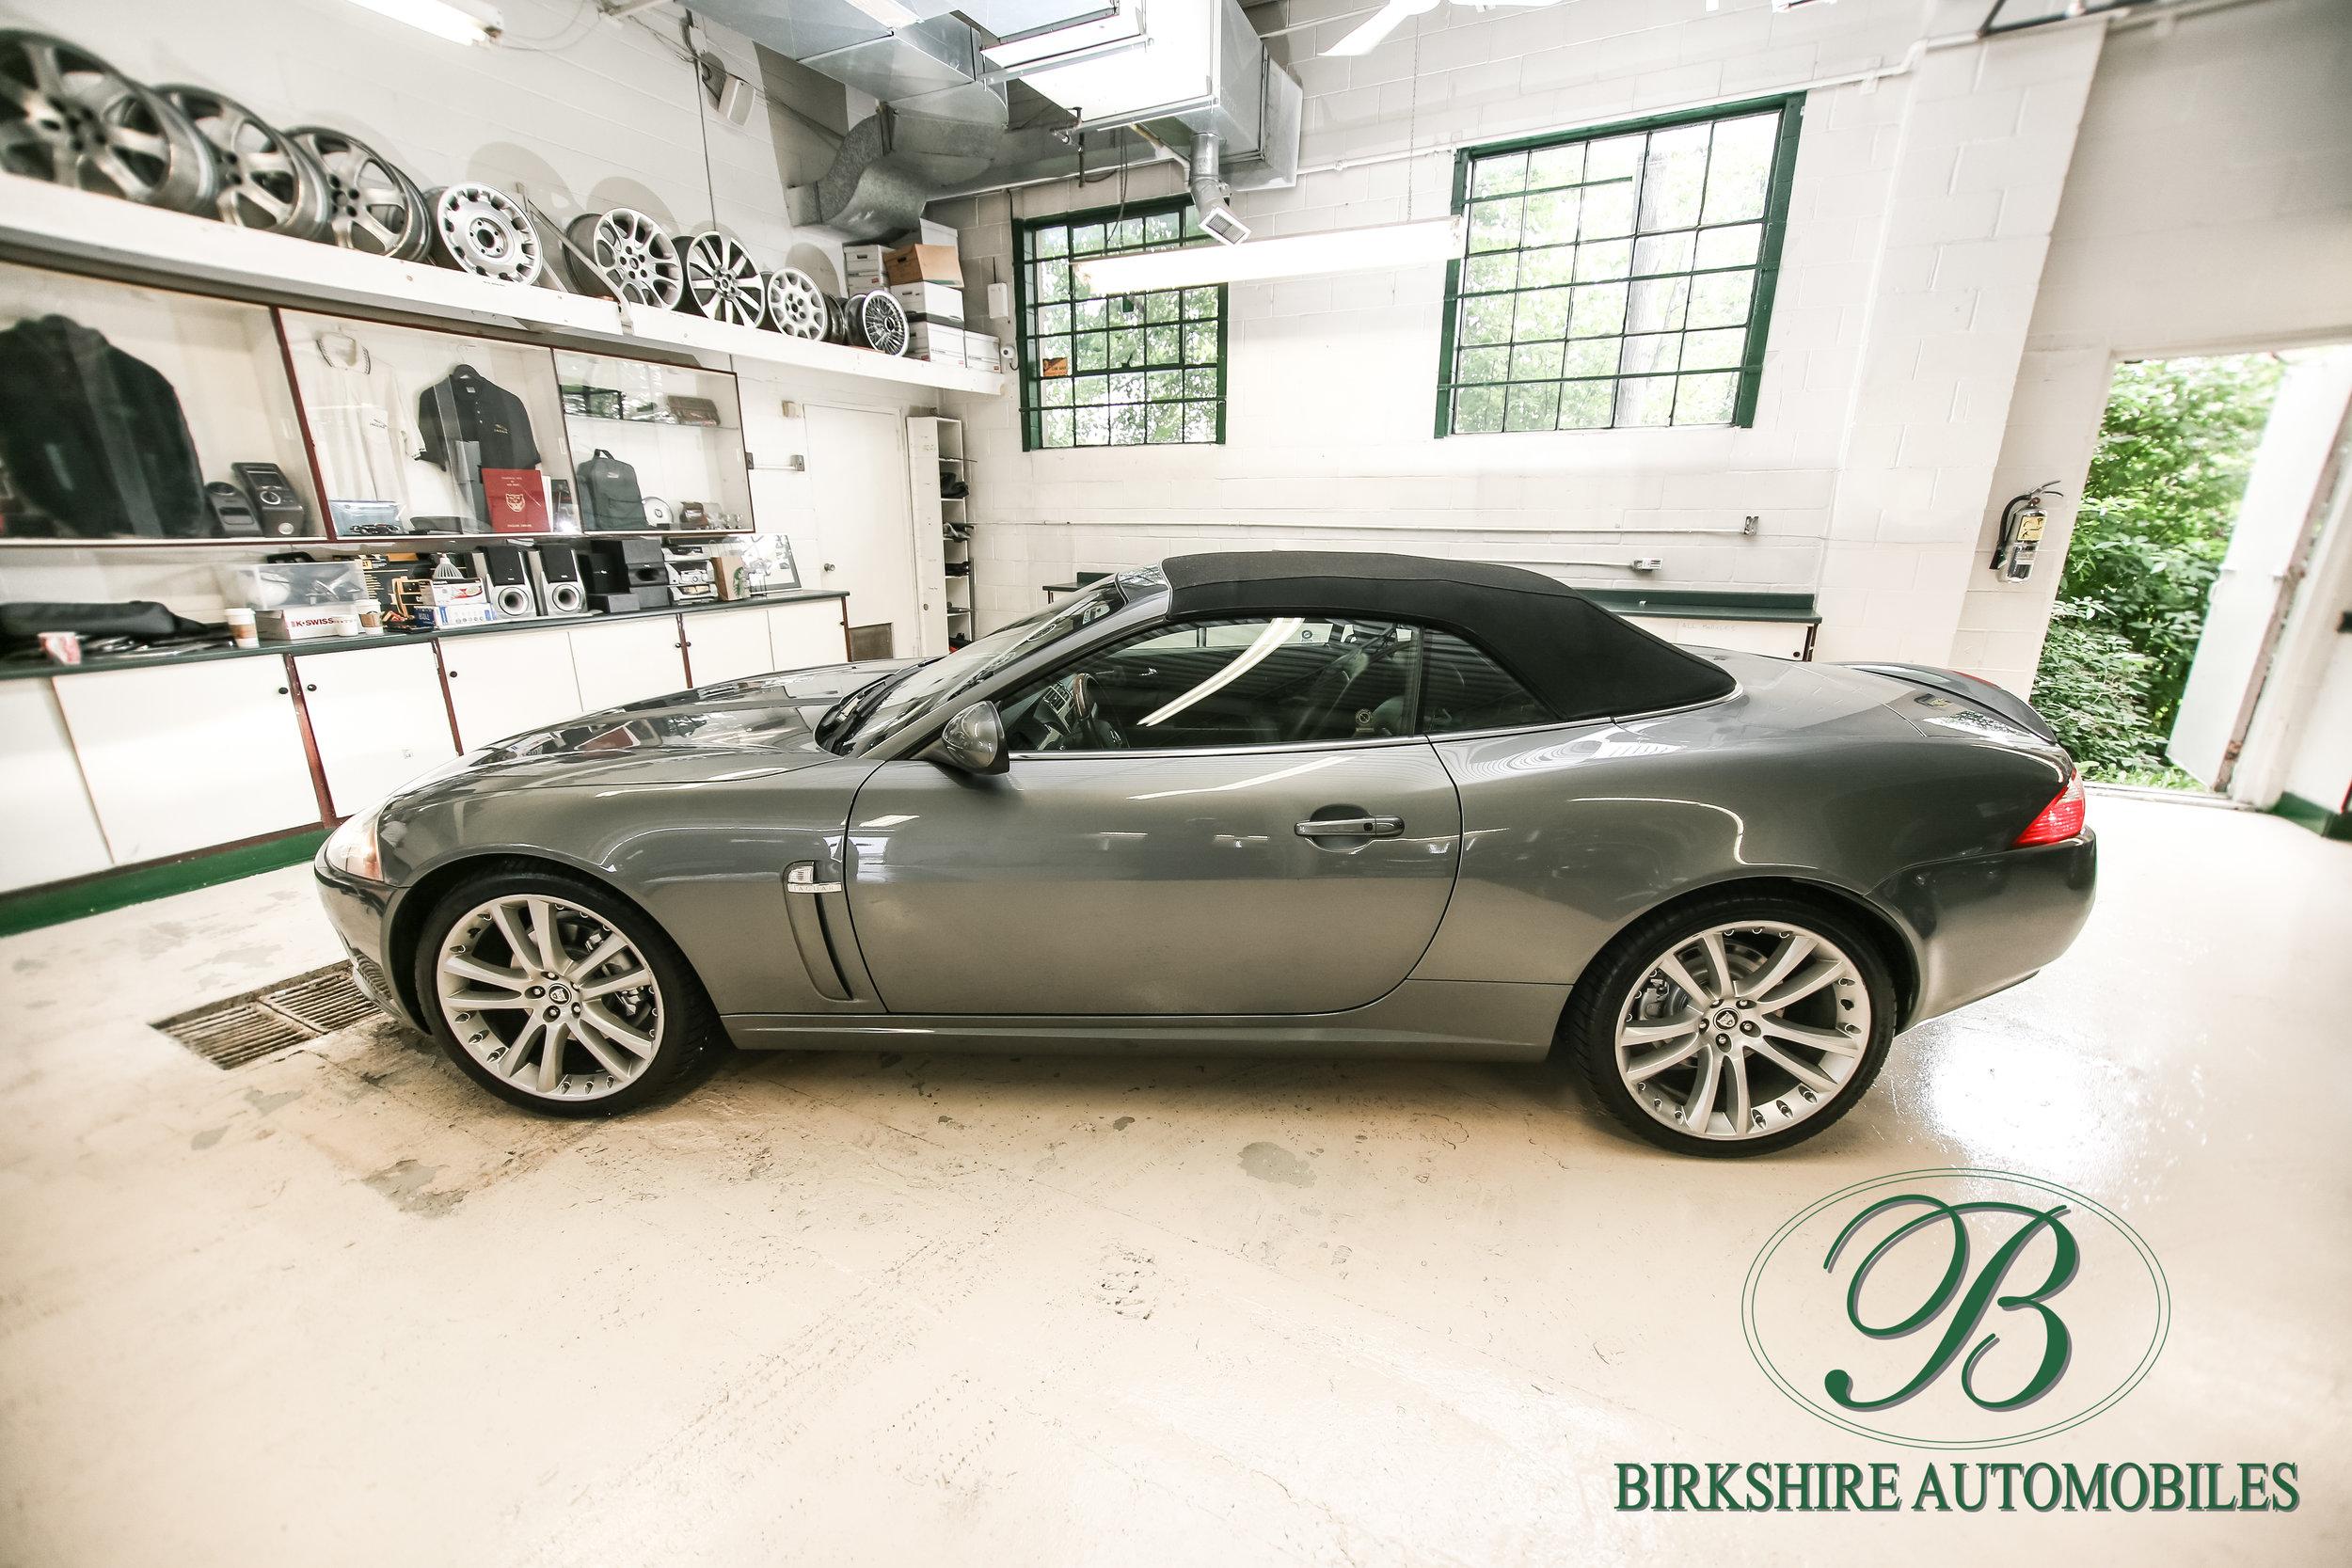 Birkshire Automobiles-159.jpg